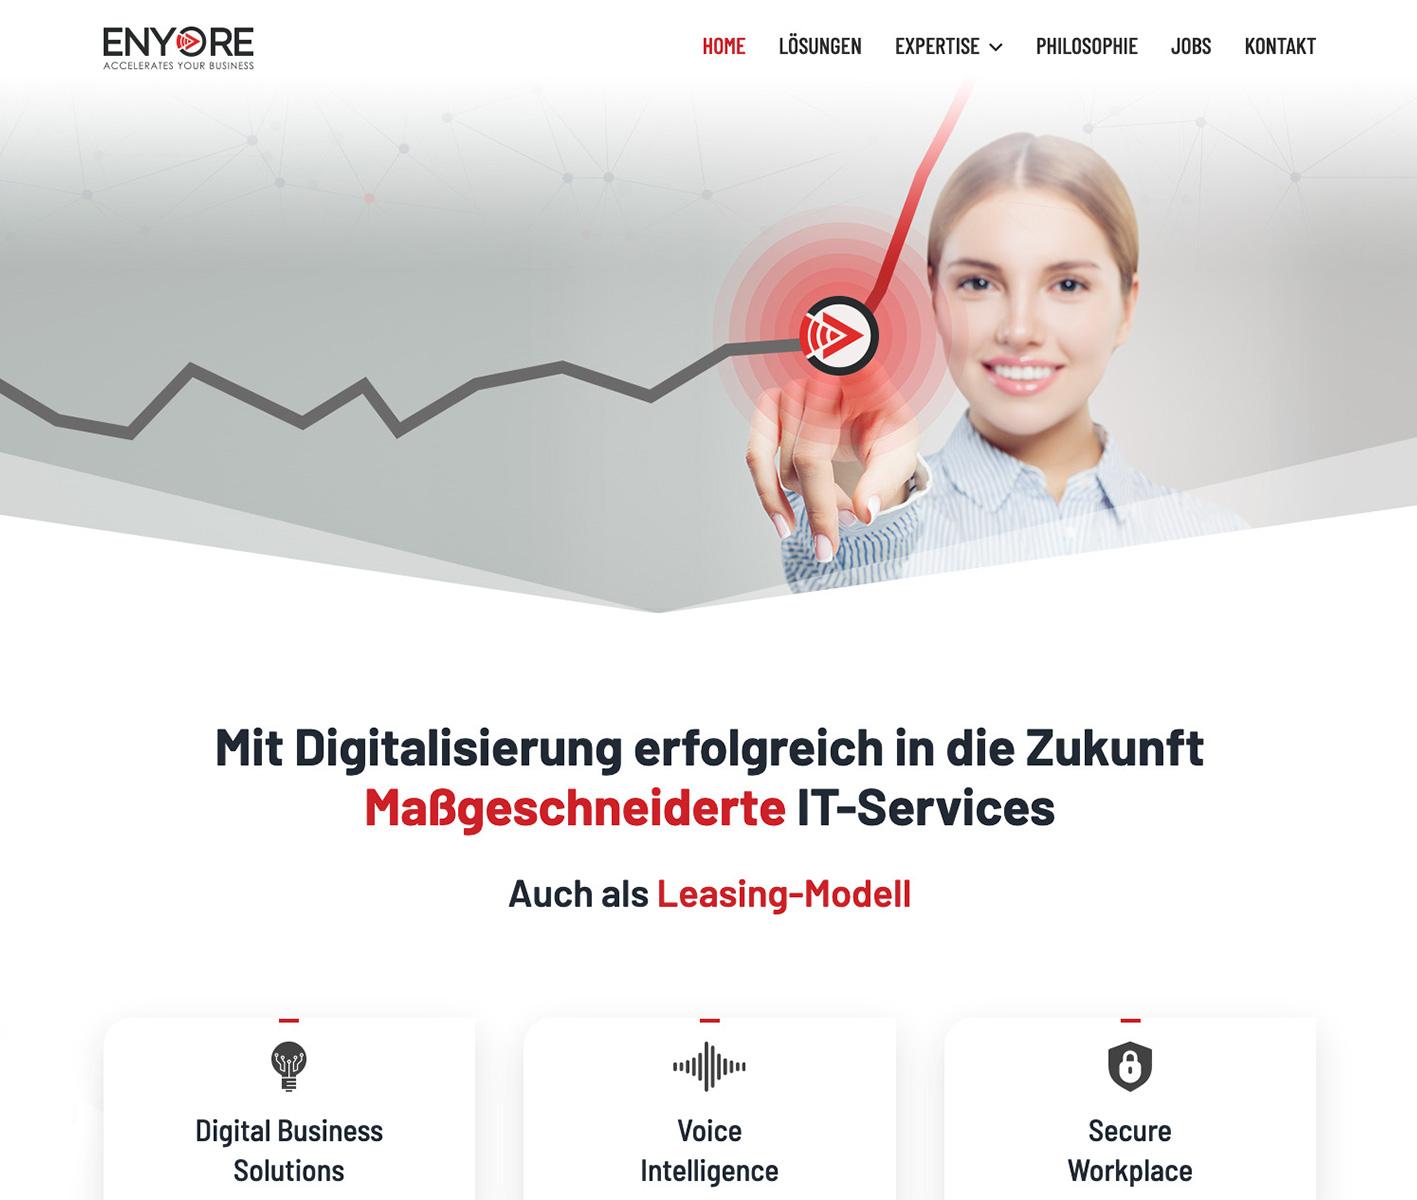 webdesign-enyore-gmbh